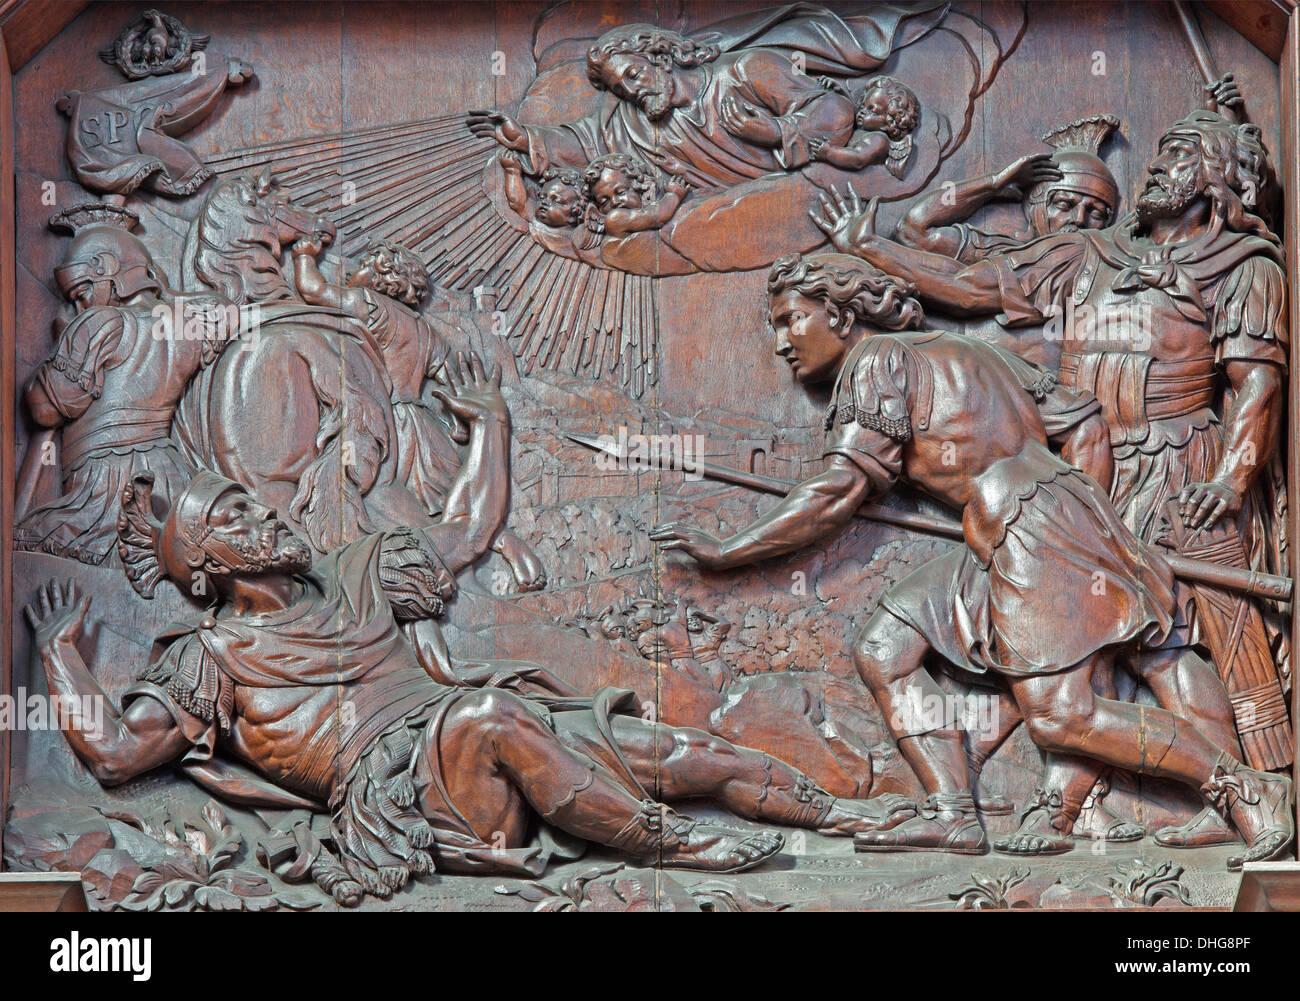 ANTWERP, BELGIUM - SEPTEMBER 5: Carved relief of Conversion of st. Paul in St. Pauls church (Paulskerk) - Stock Image